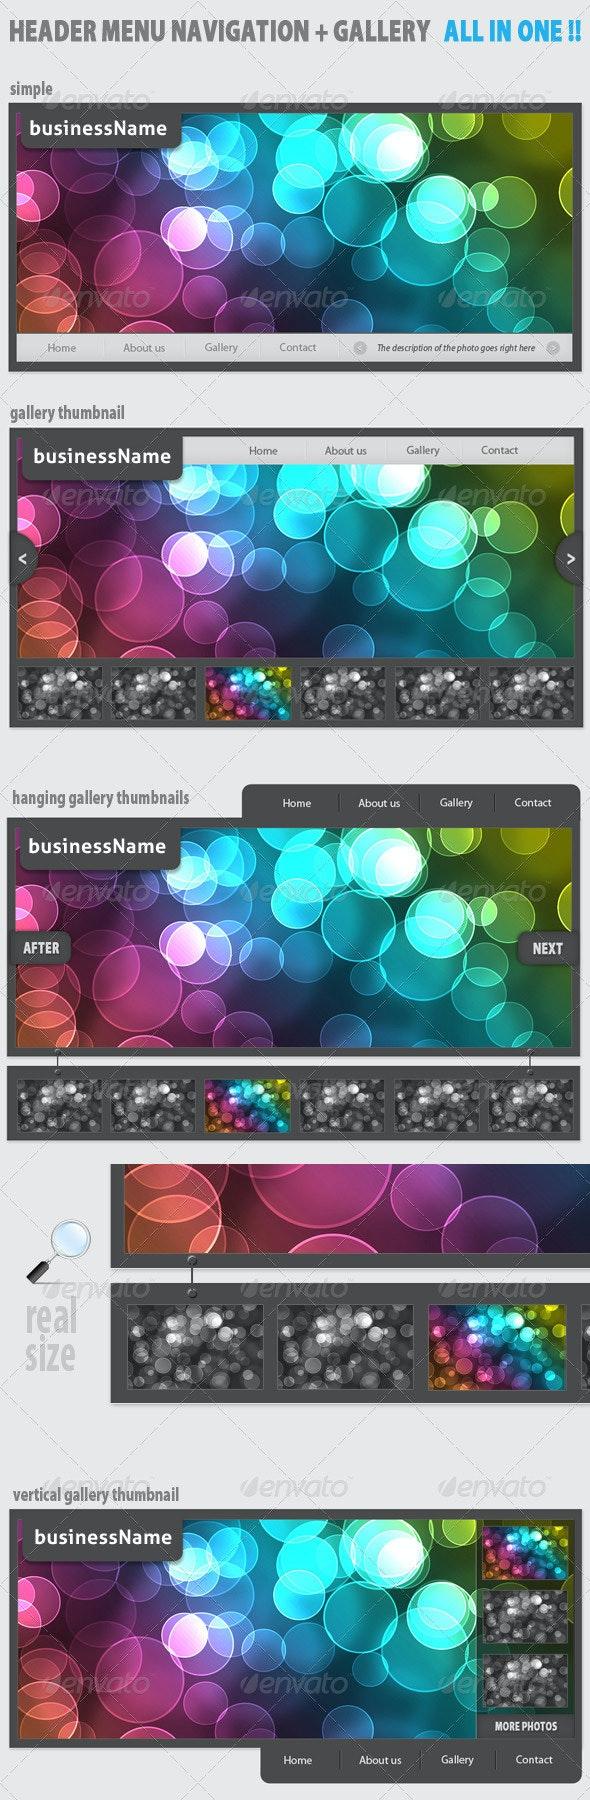 Modern Header Menu navigation + Gallery + Thumbs!  - Web Elements